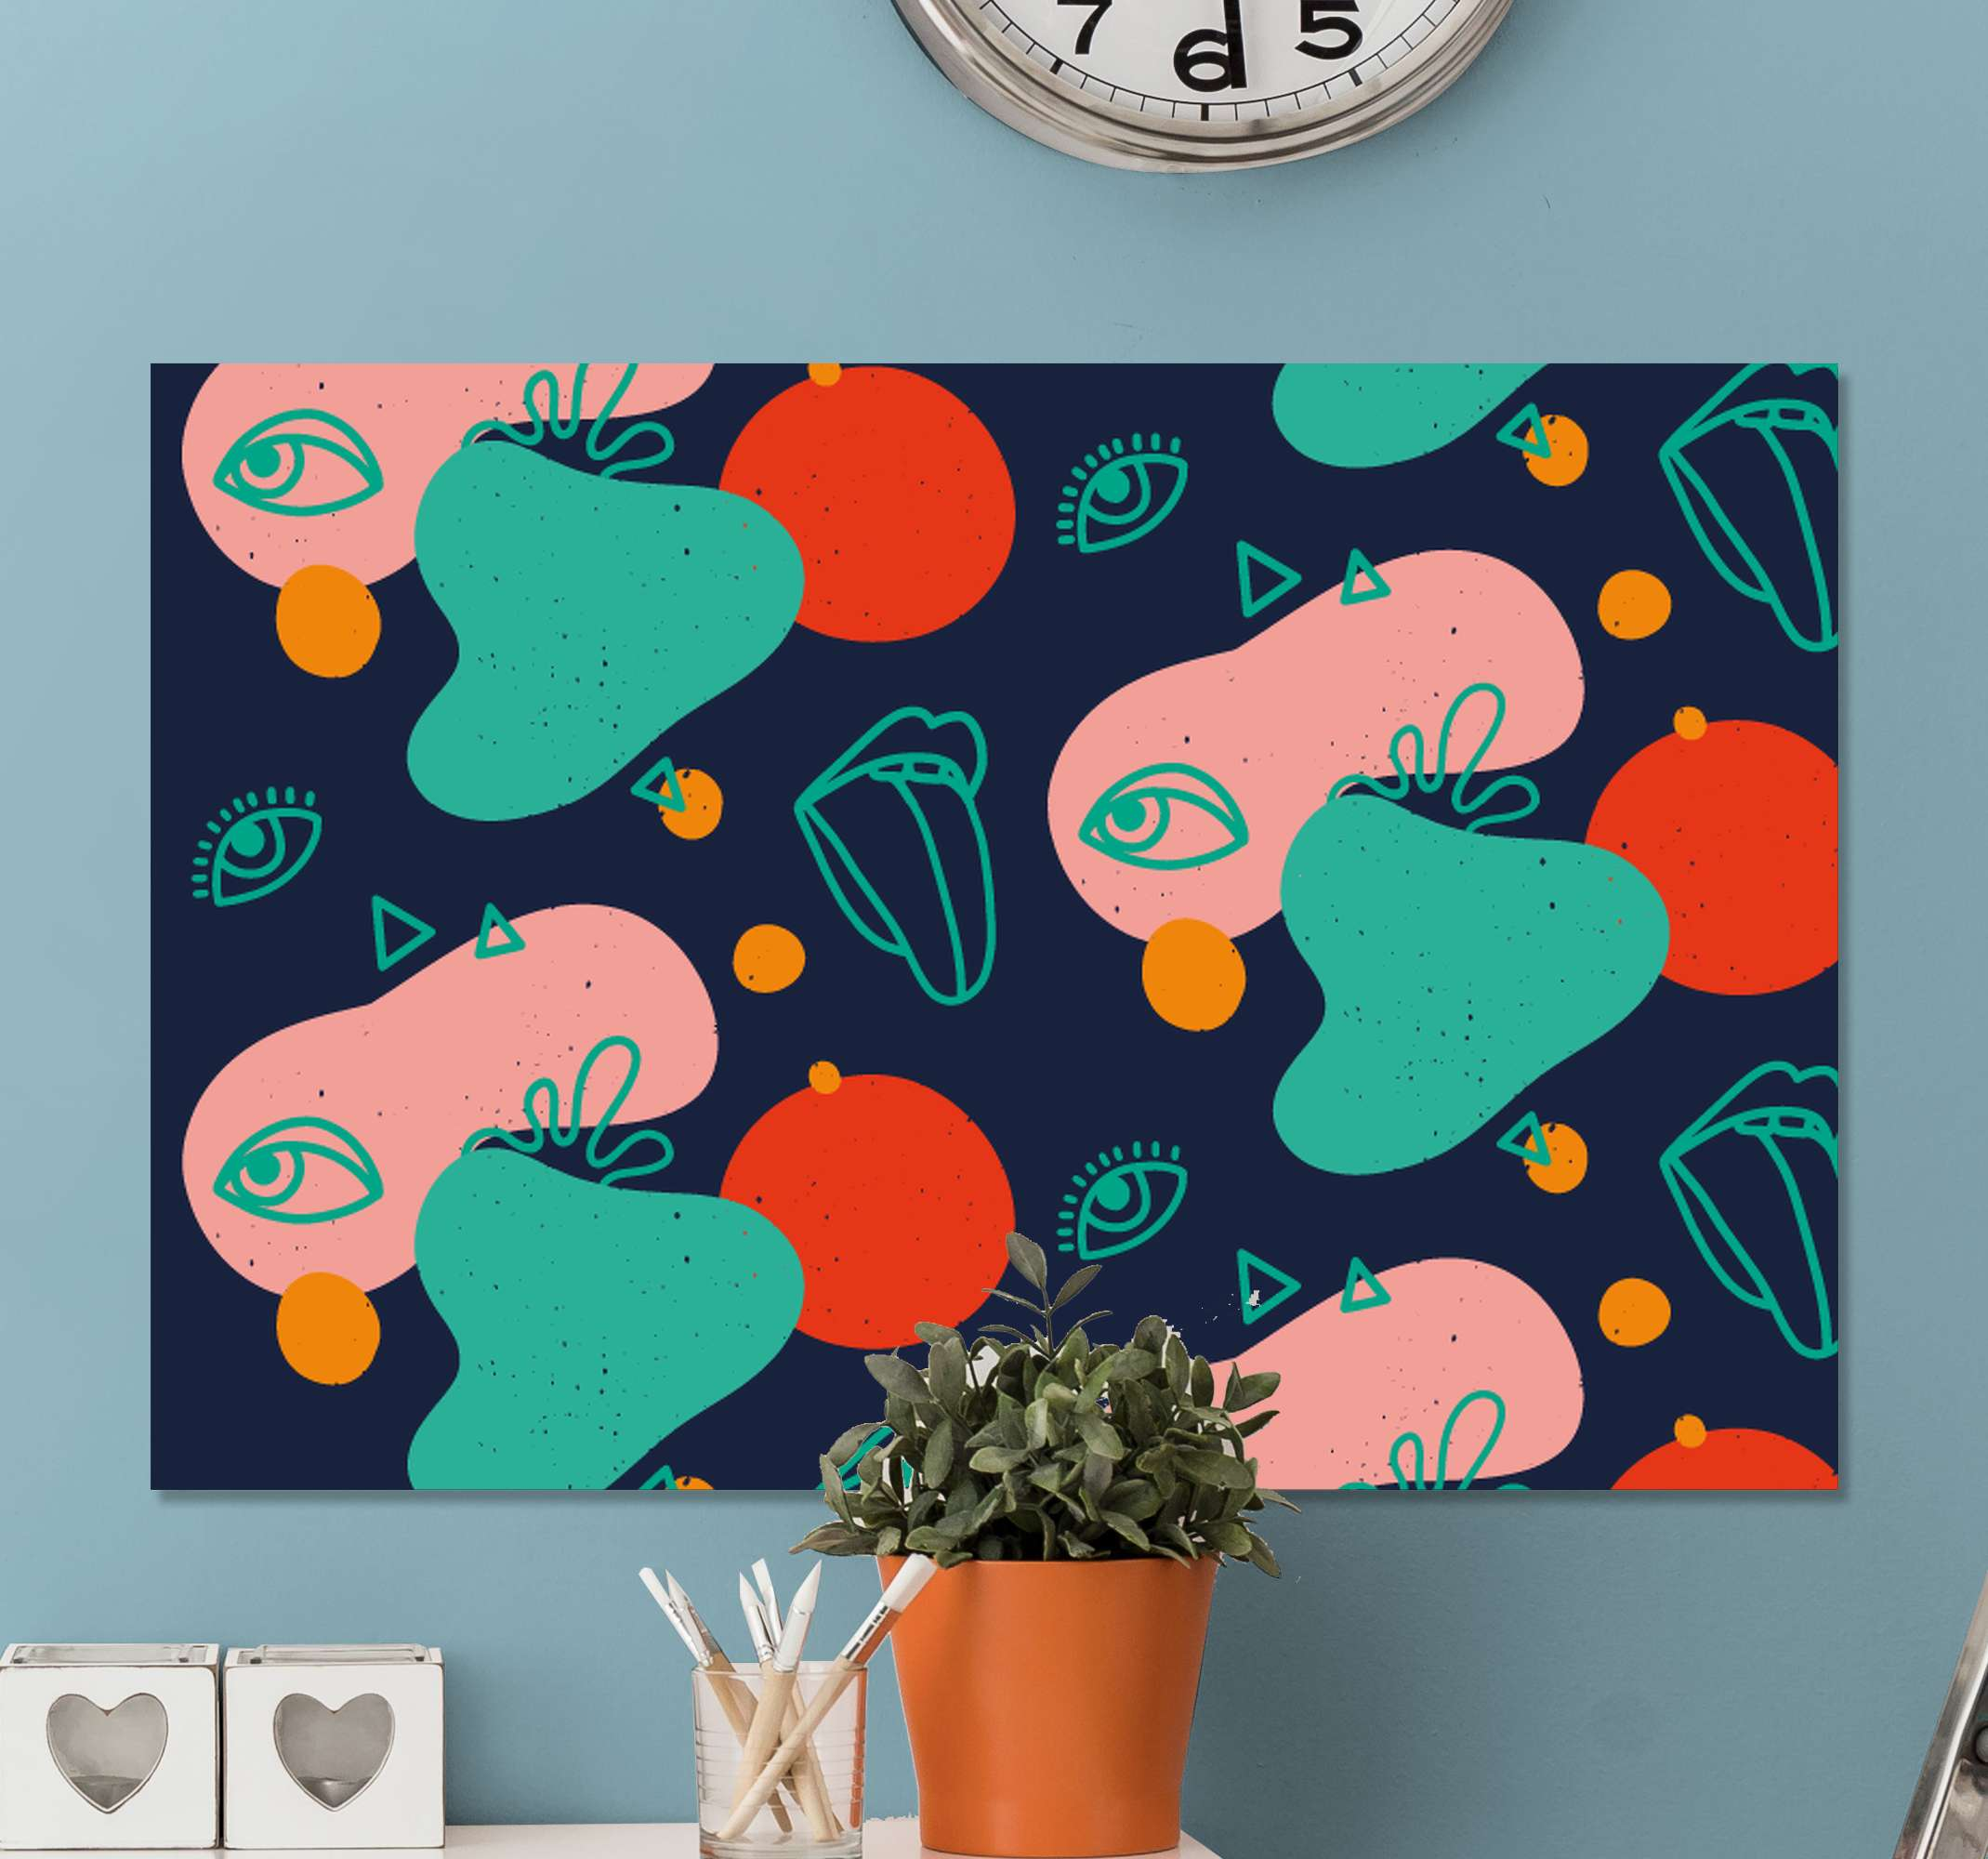 TenStickers. 孟菲斯的嘴唇和眼睛画布艺术. 令人难以置信的详细彩色画布墙艺术,非常适合您的家!拥有+10,000名满意的客户,您将放心。